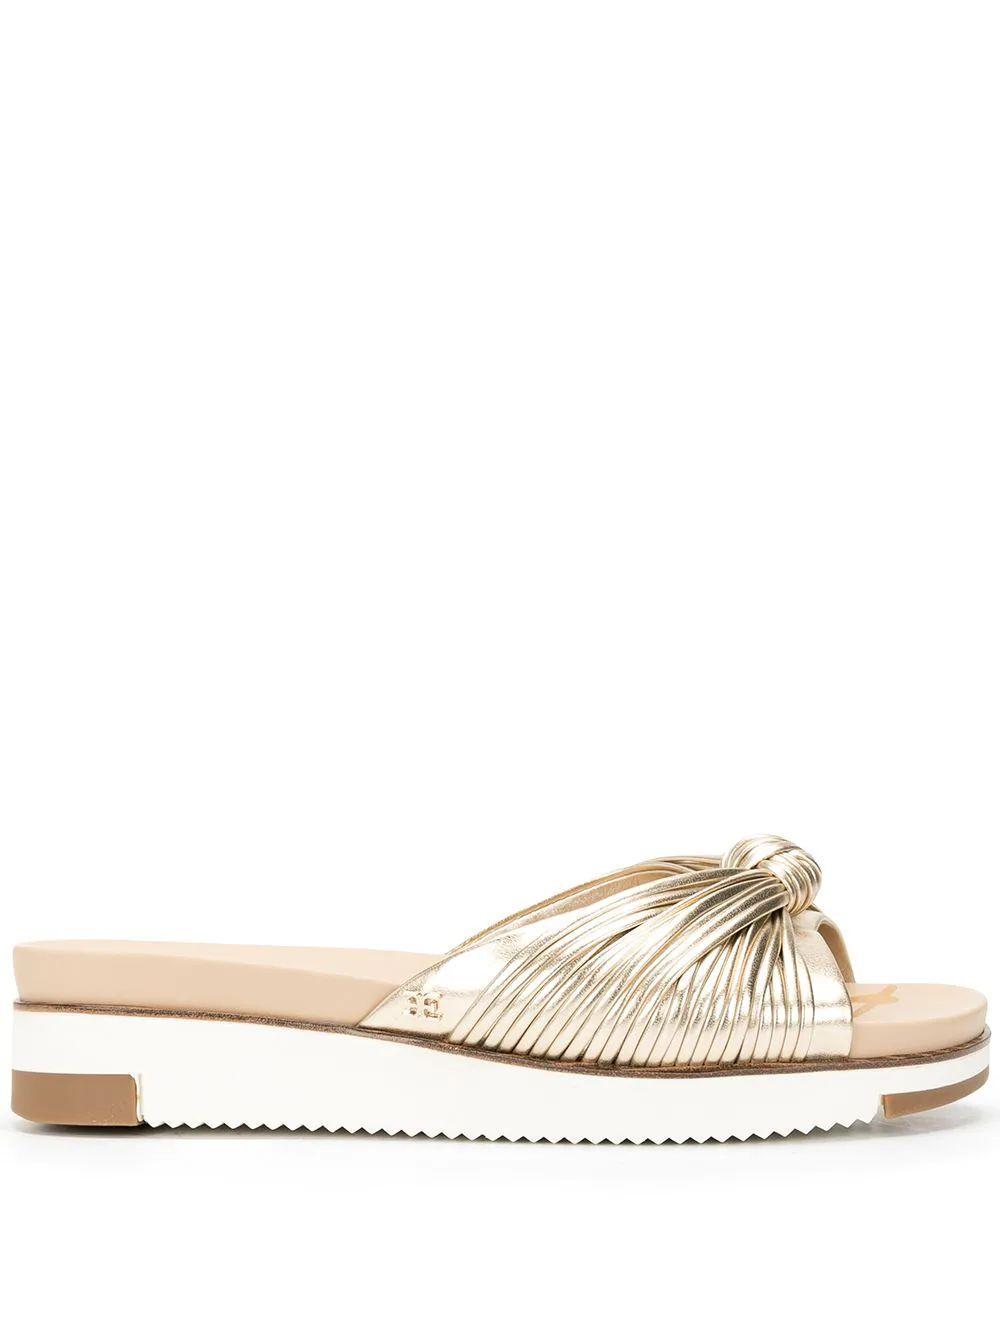 Adriel Slide Sandal Item # ADRIEL